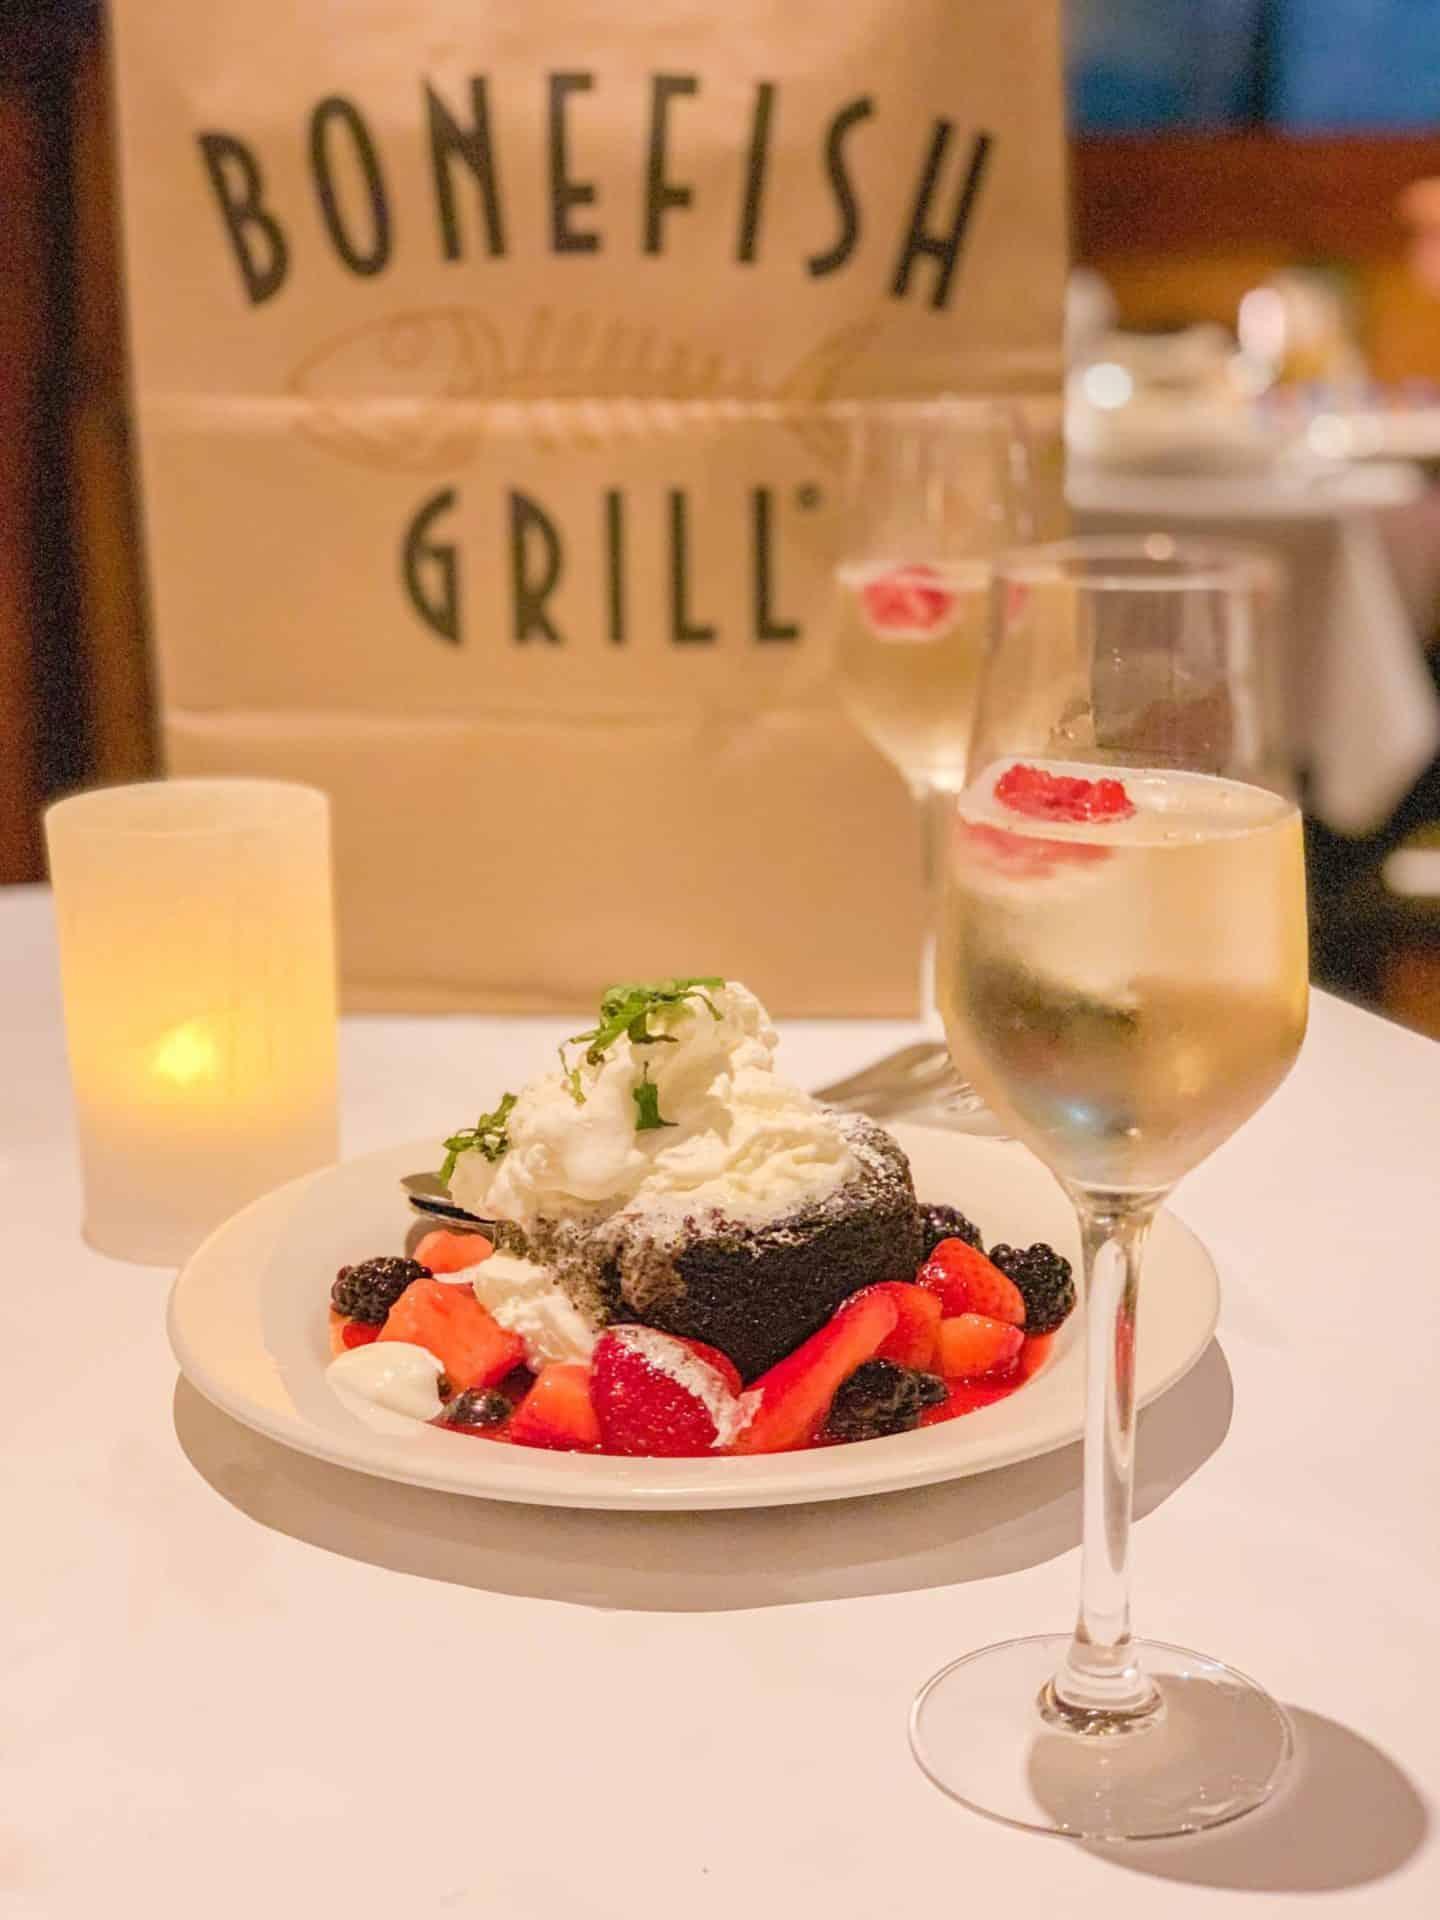 ShaundaNecole.com Our Valentine's Dinner At Bonefish Grill